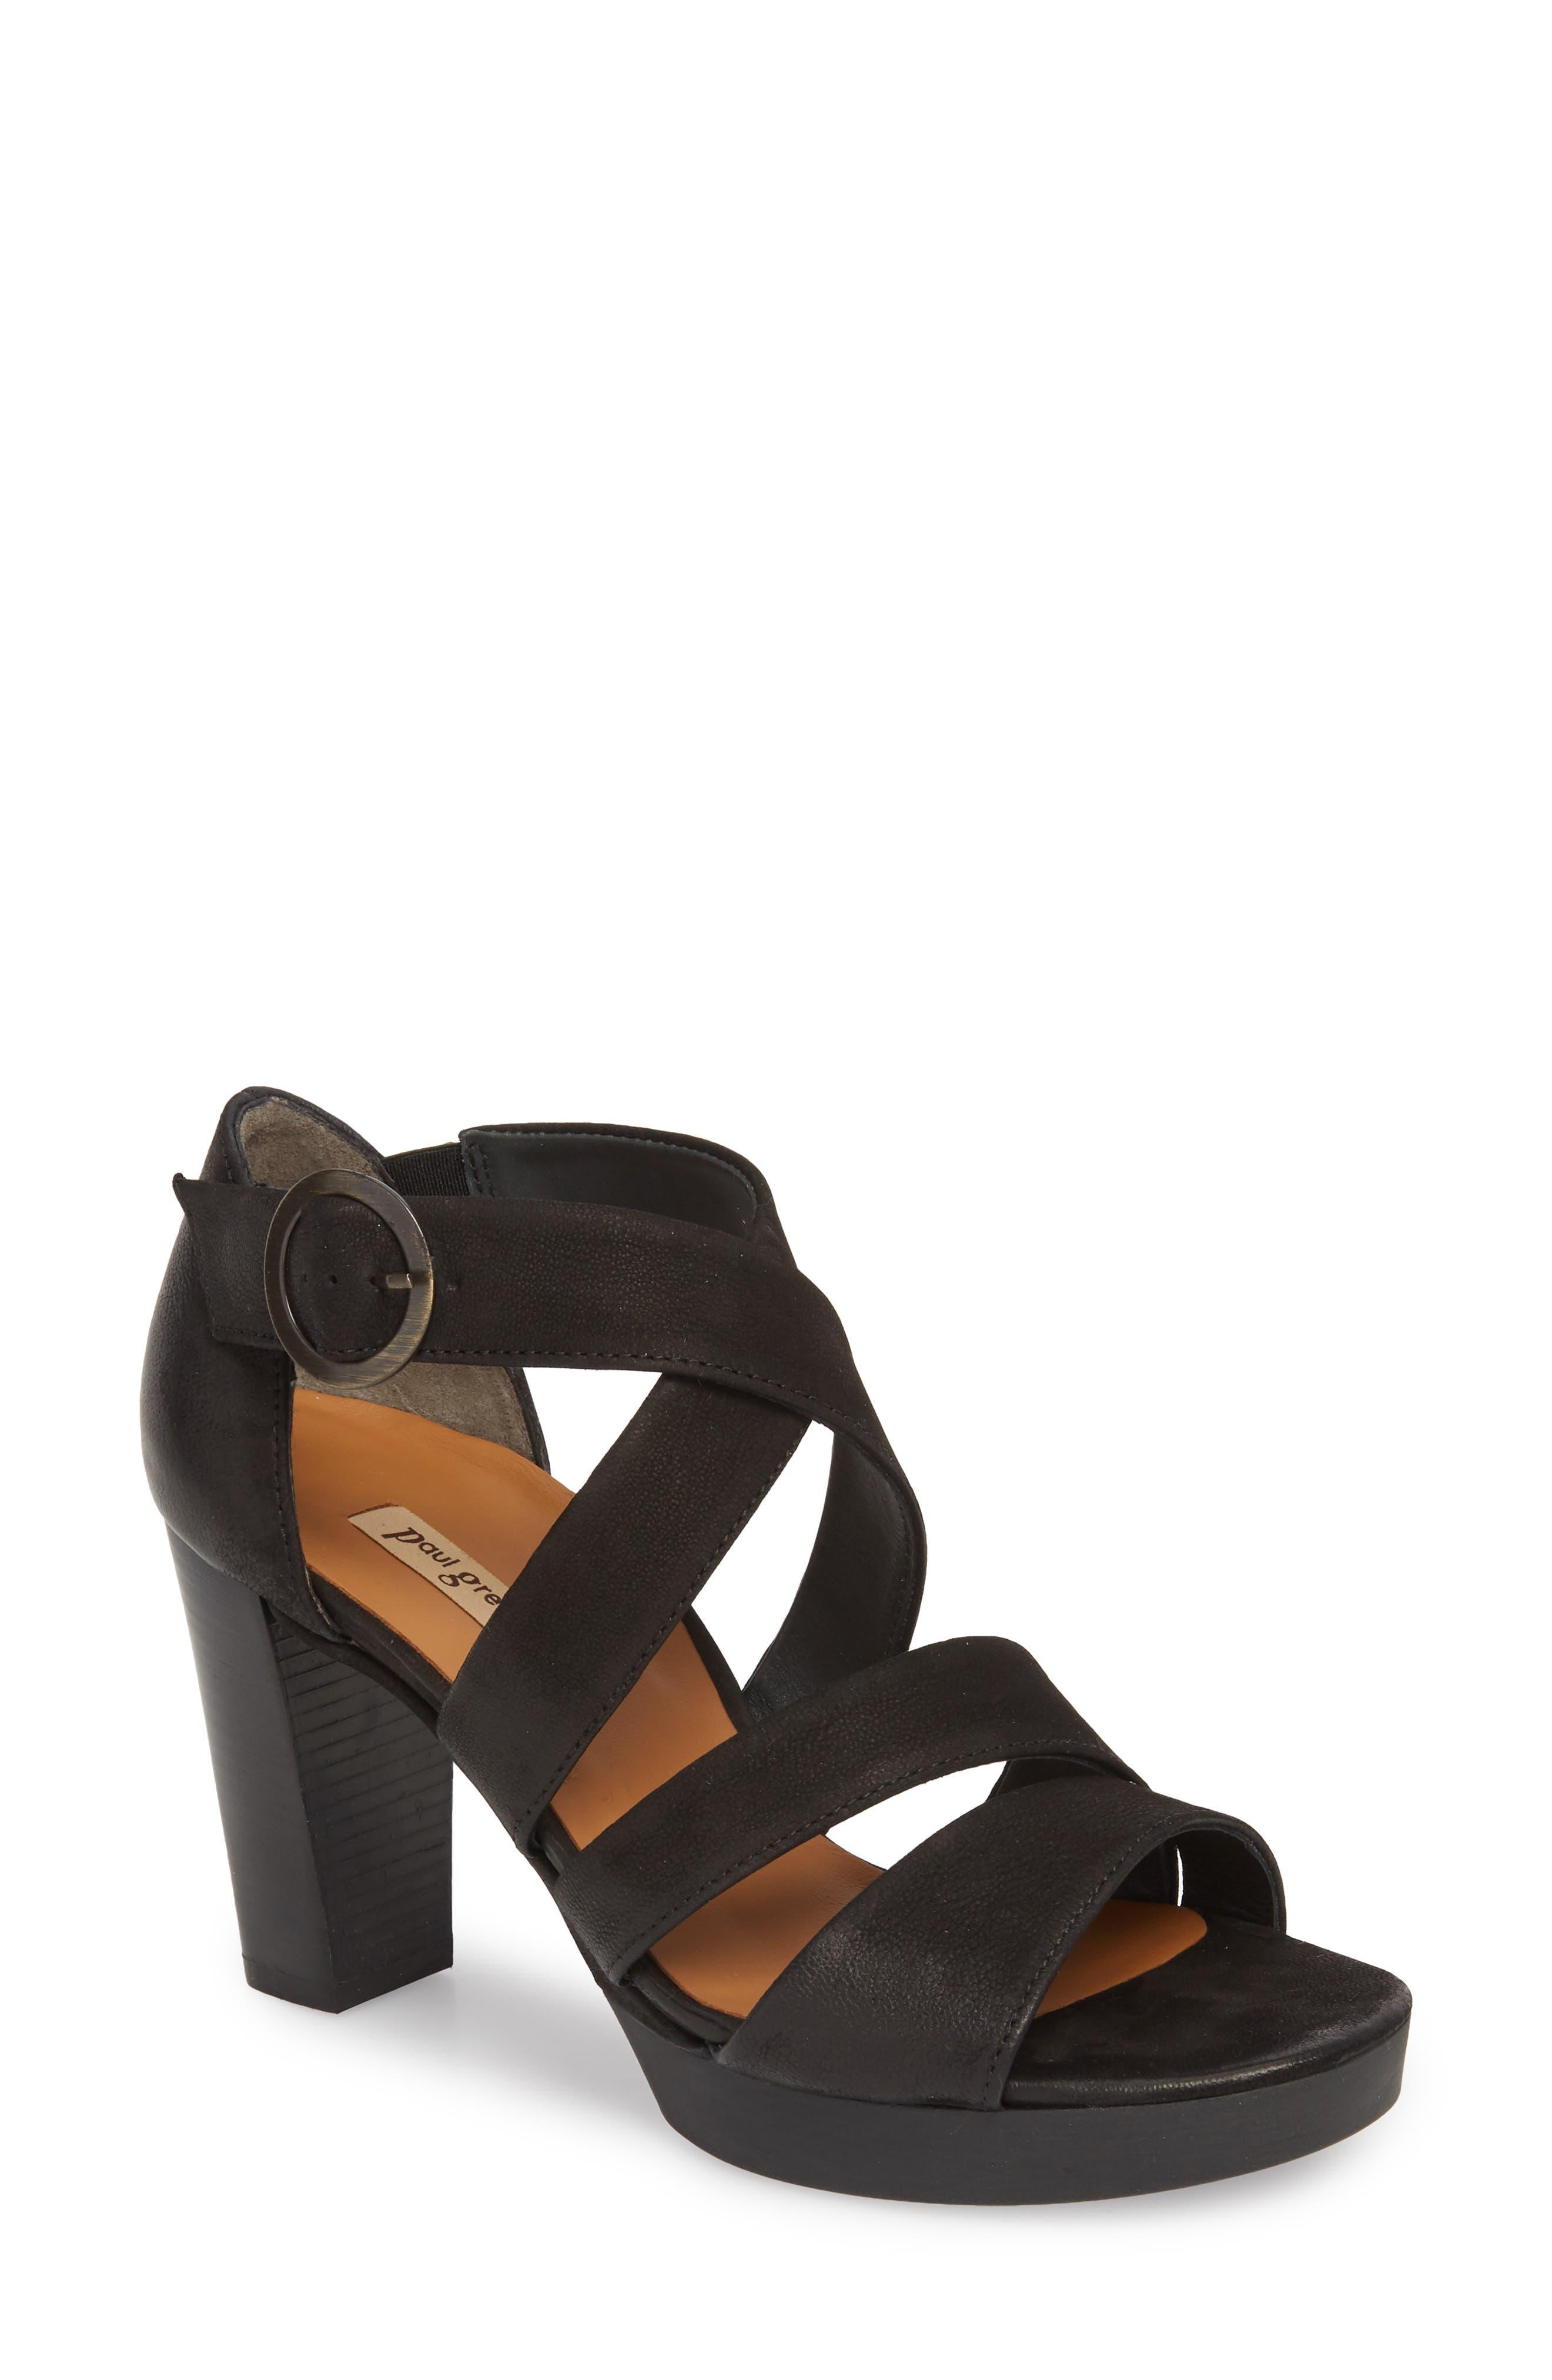 Main Image - Paul Green Riviera Strappy Sandal (Women)